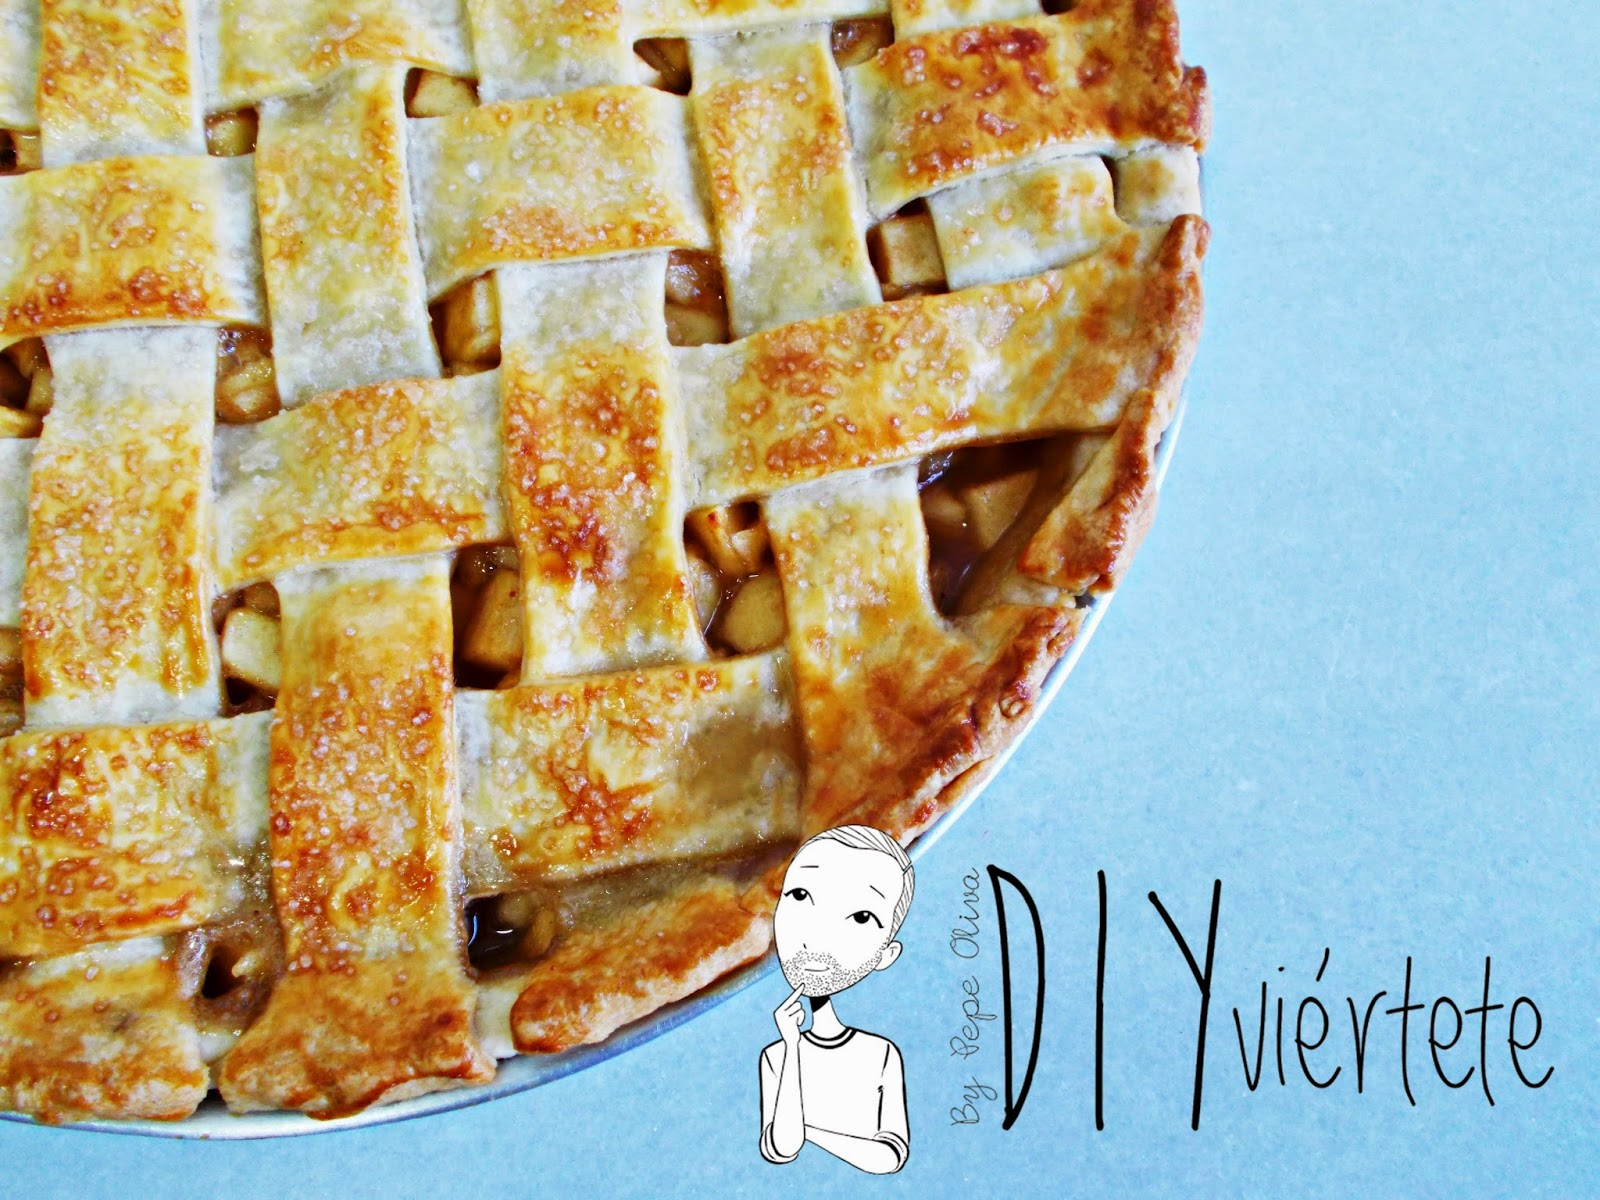 Receta-cocina-postre-reposteria-tarta de manzana-apple pie-pie de manzana-canela-fruta-2